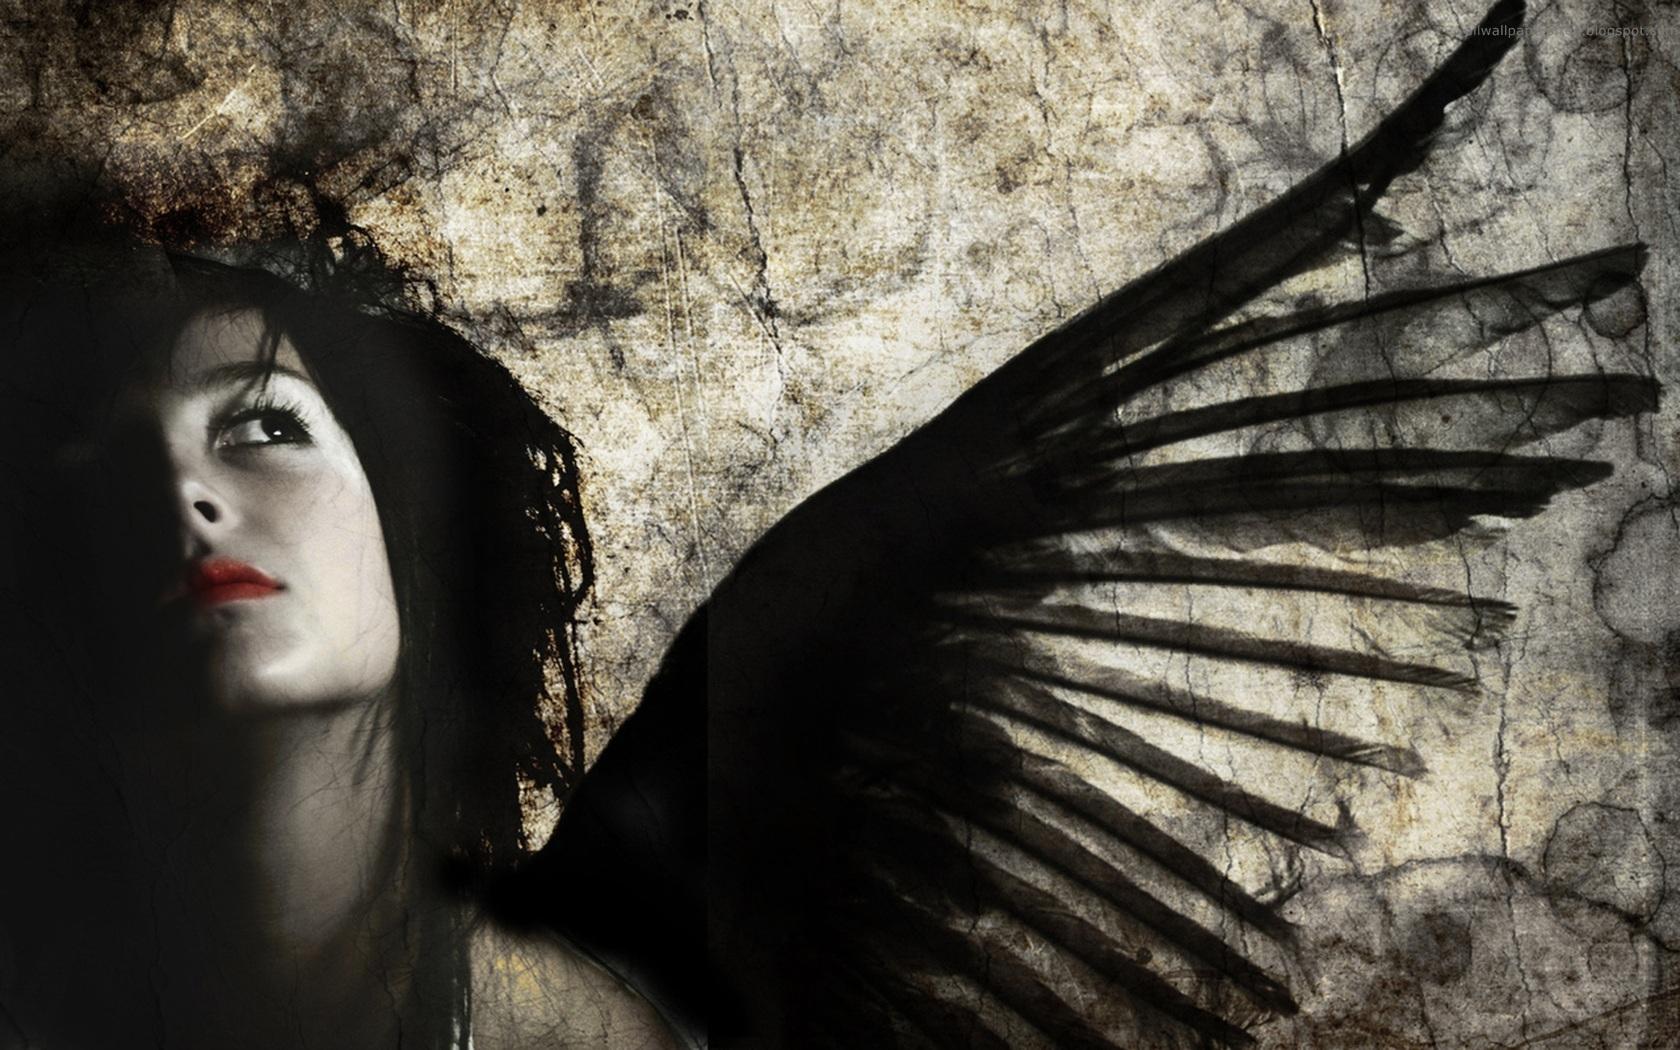 dark horror gothic angel - photo #6